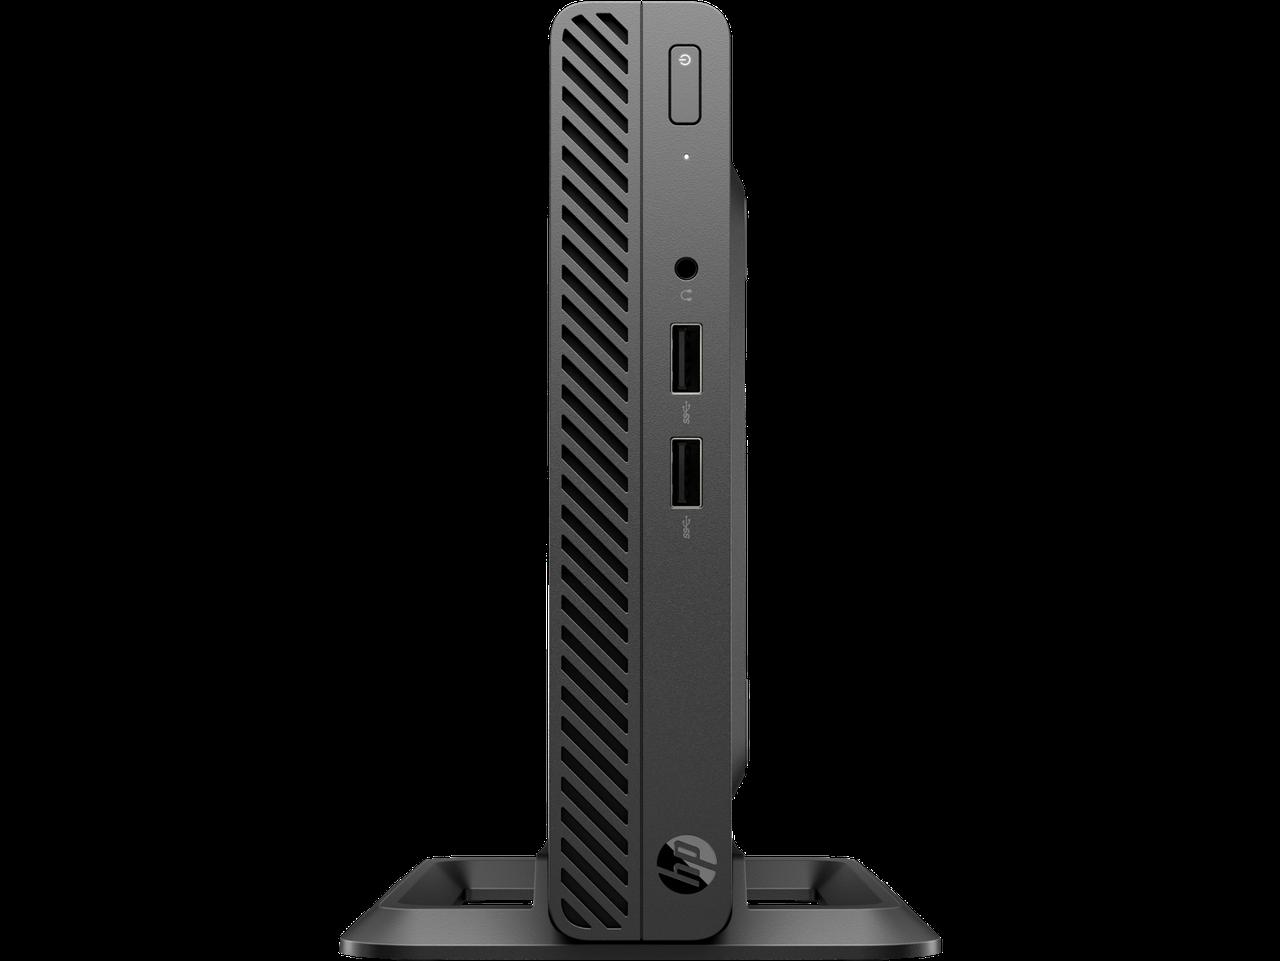 Мини ПК HP 4YV62EA 260 G3 DM i3-7130U 256GB 4.0GB Corei3-7130U / 4GB / 256GB M.2 PCIe NVMe / DOS / 1yw / kbd /